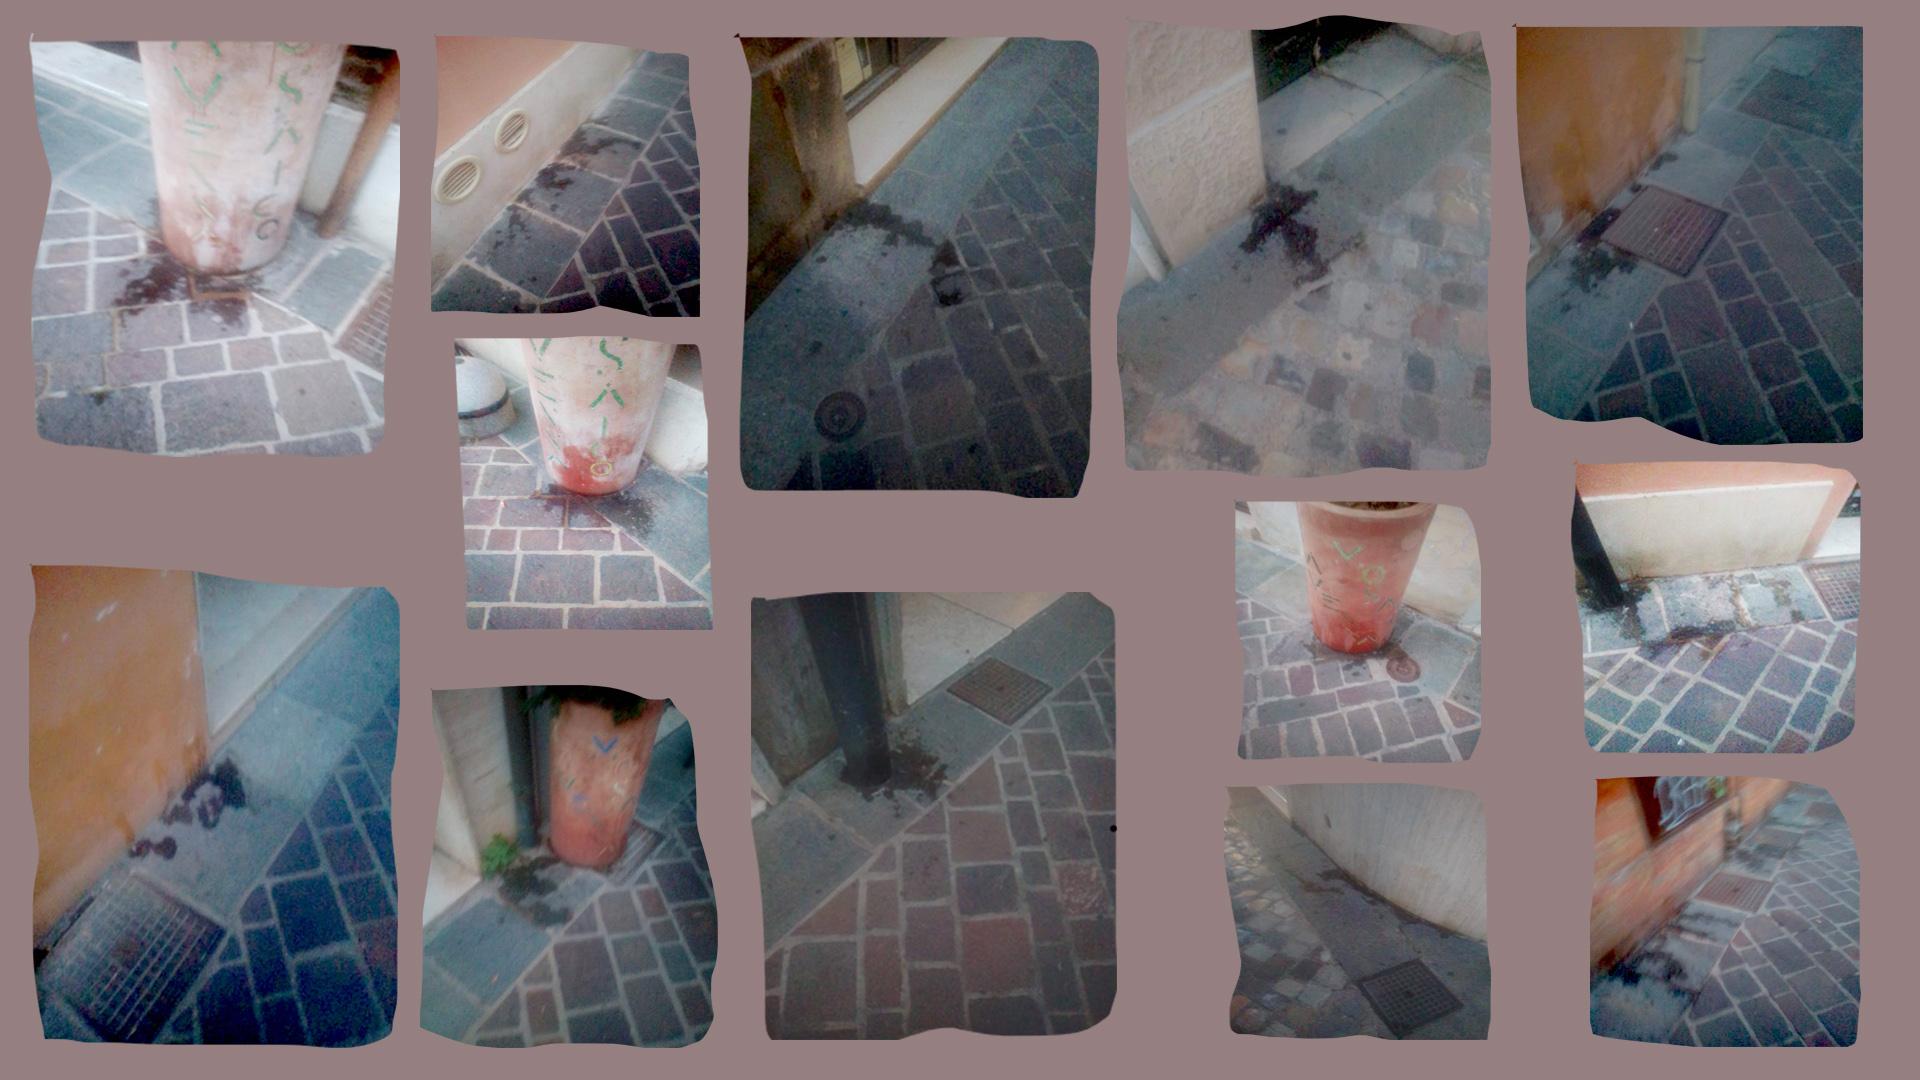 hater mosaic n 7